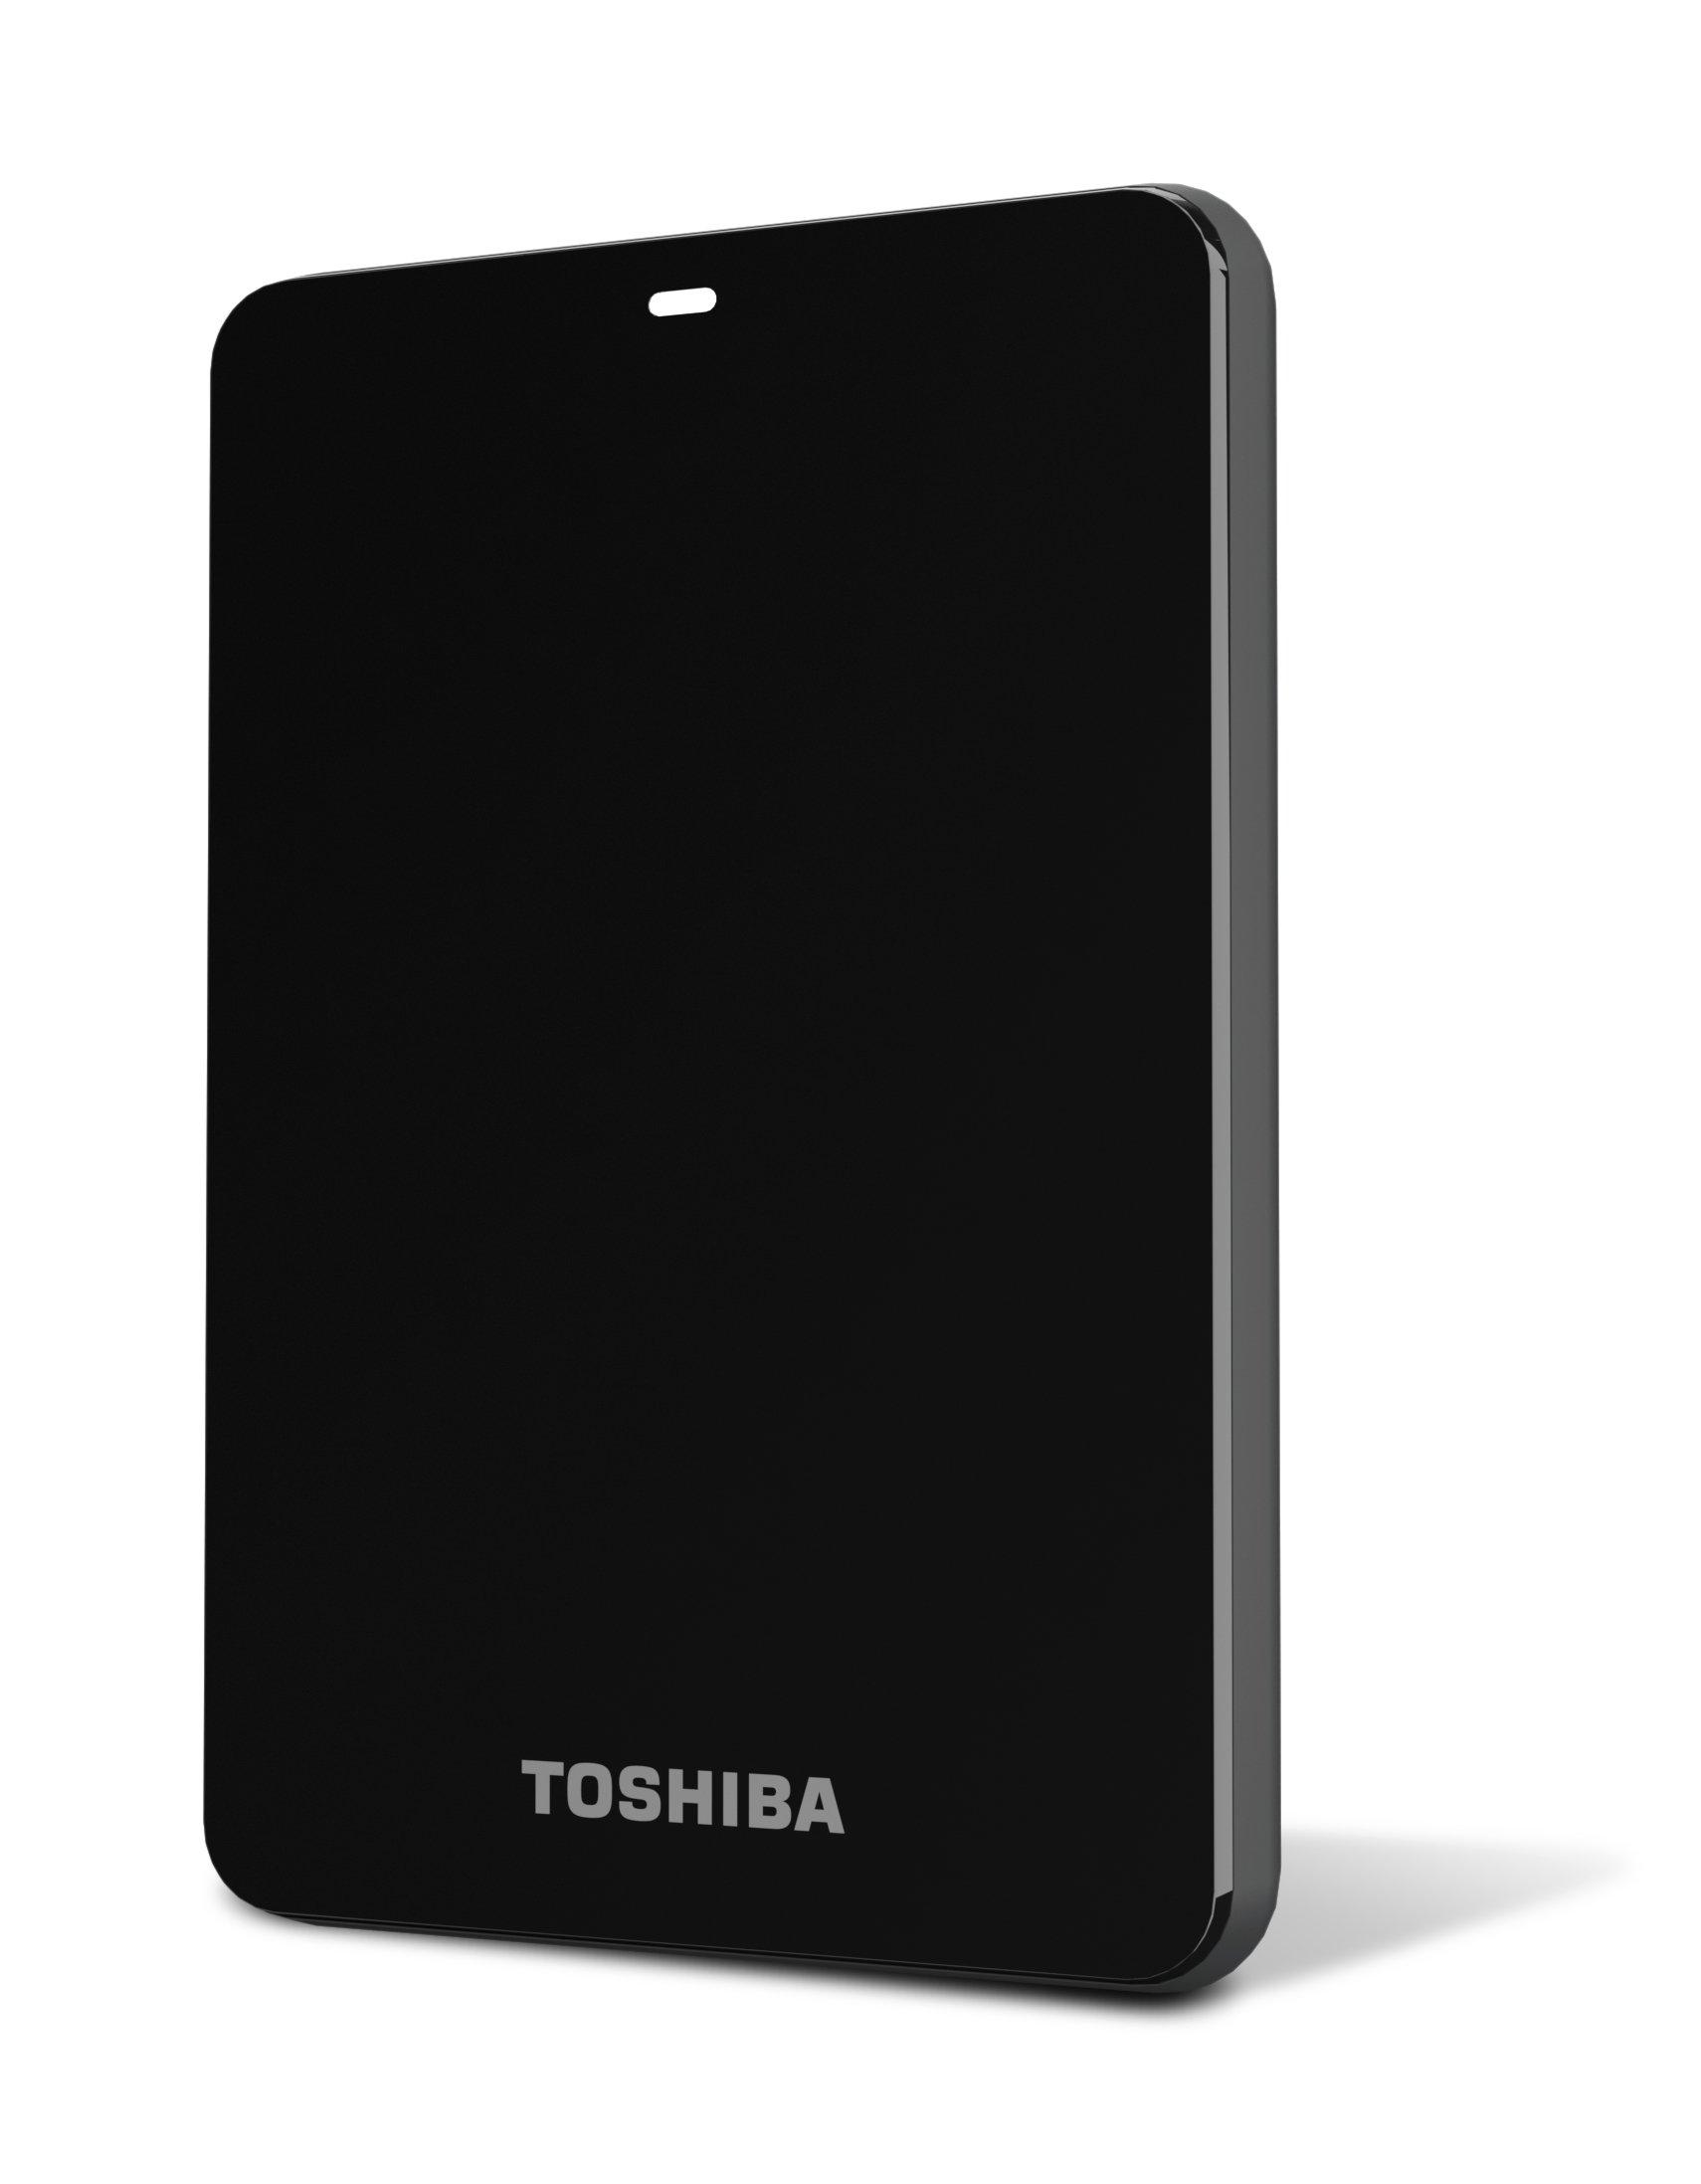 Toshiba Canvio 1.0 TB USB 3.0 Portable Hard Drive - HDTC610XK3B1 (Black)